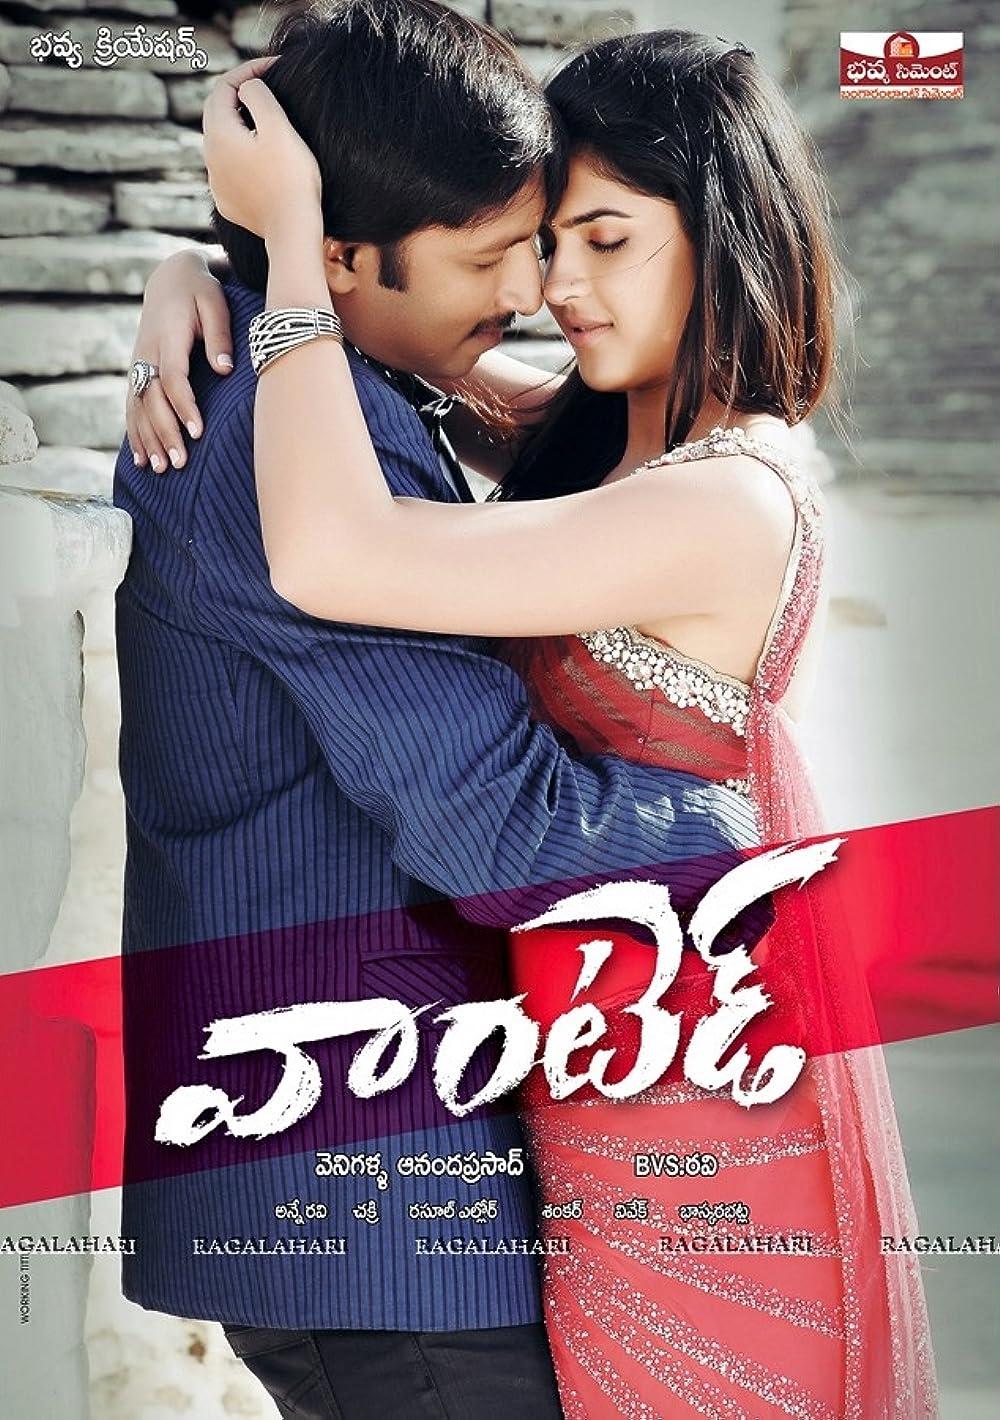 Kannada ☝️ movierulz 2021 by best names in matchmaking kannada movies